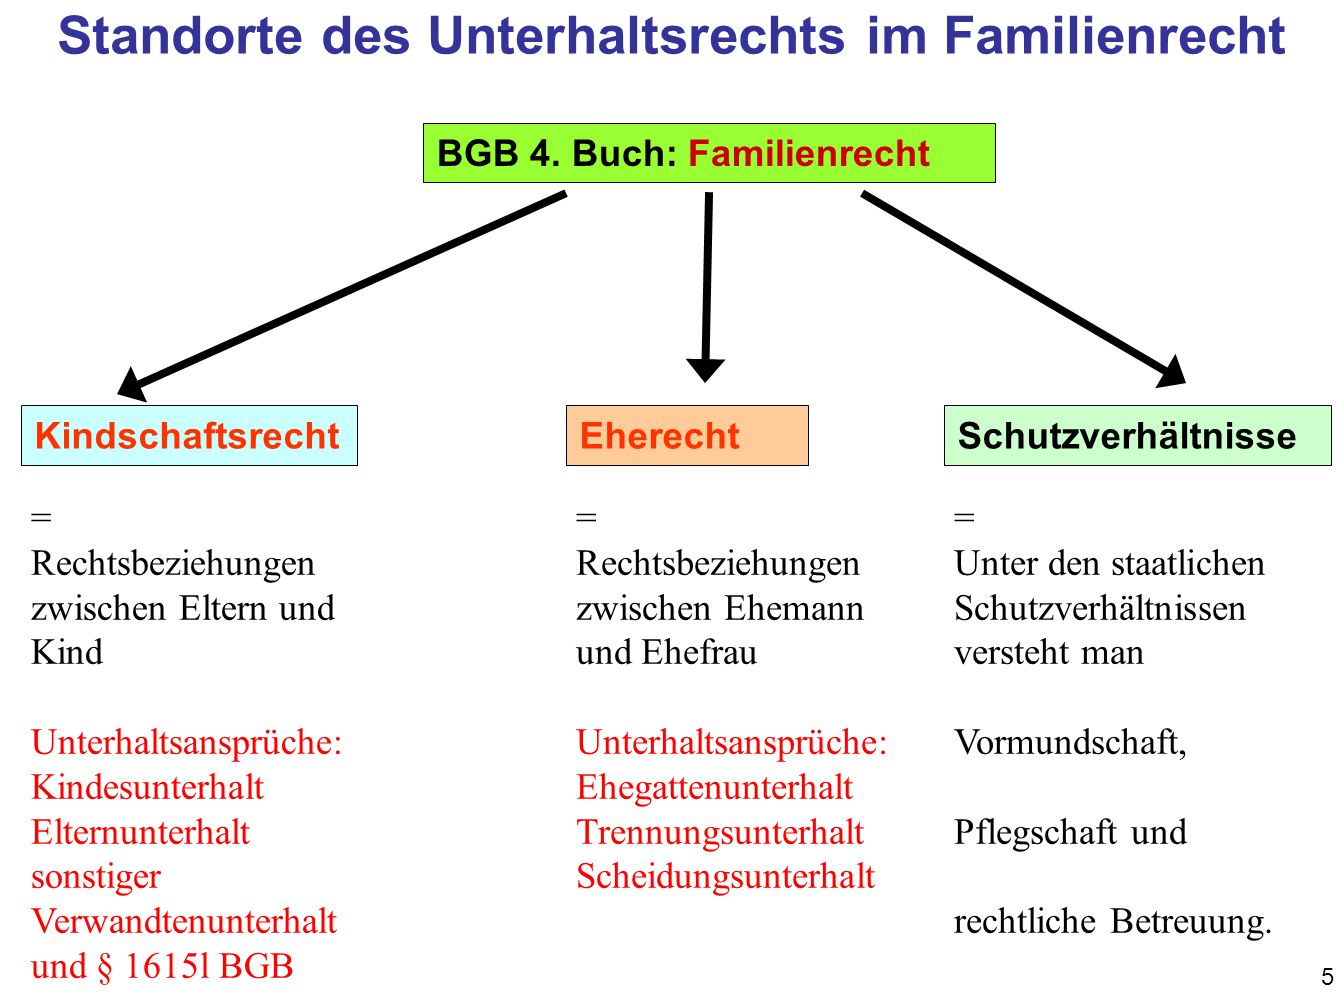 Standorte des Unterhaltsrechts im Familienrecht